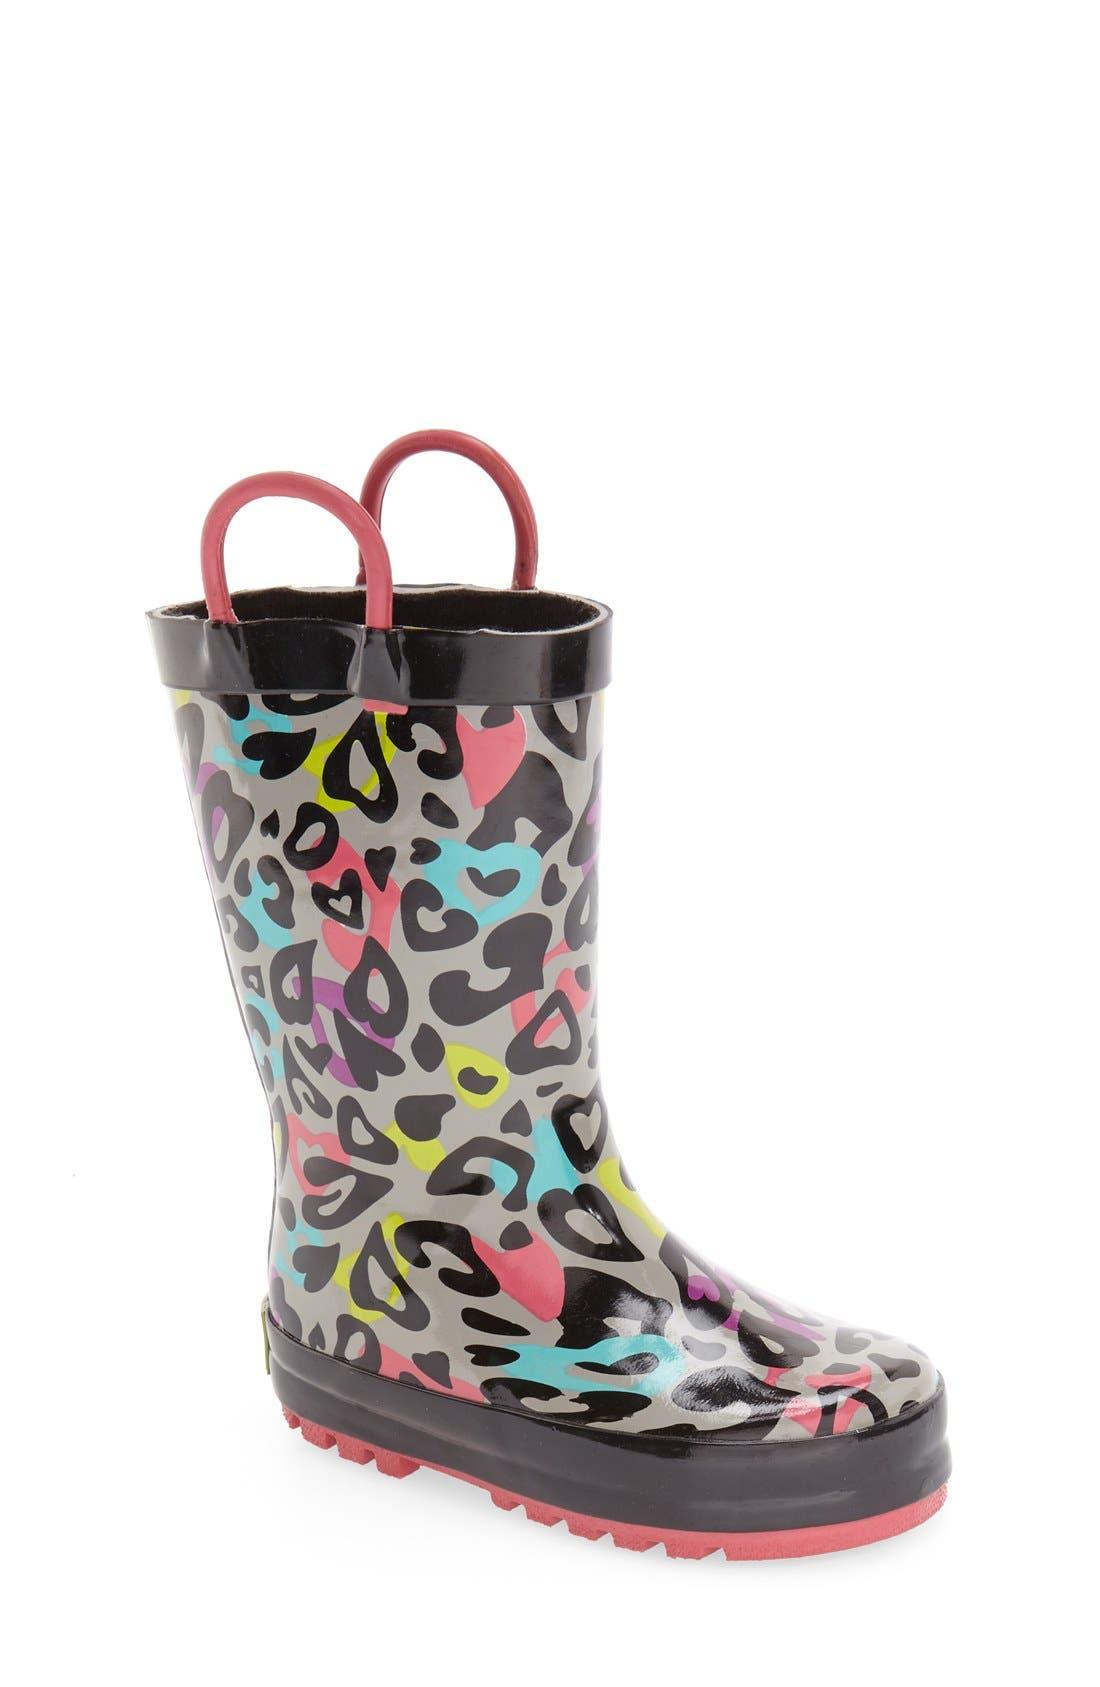 Groovy Leopard Rain Boot,                         Main,                         color, BLACK